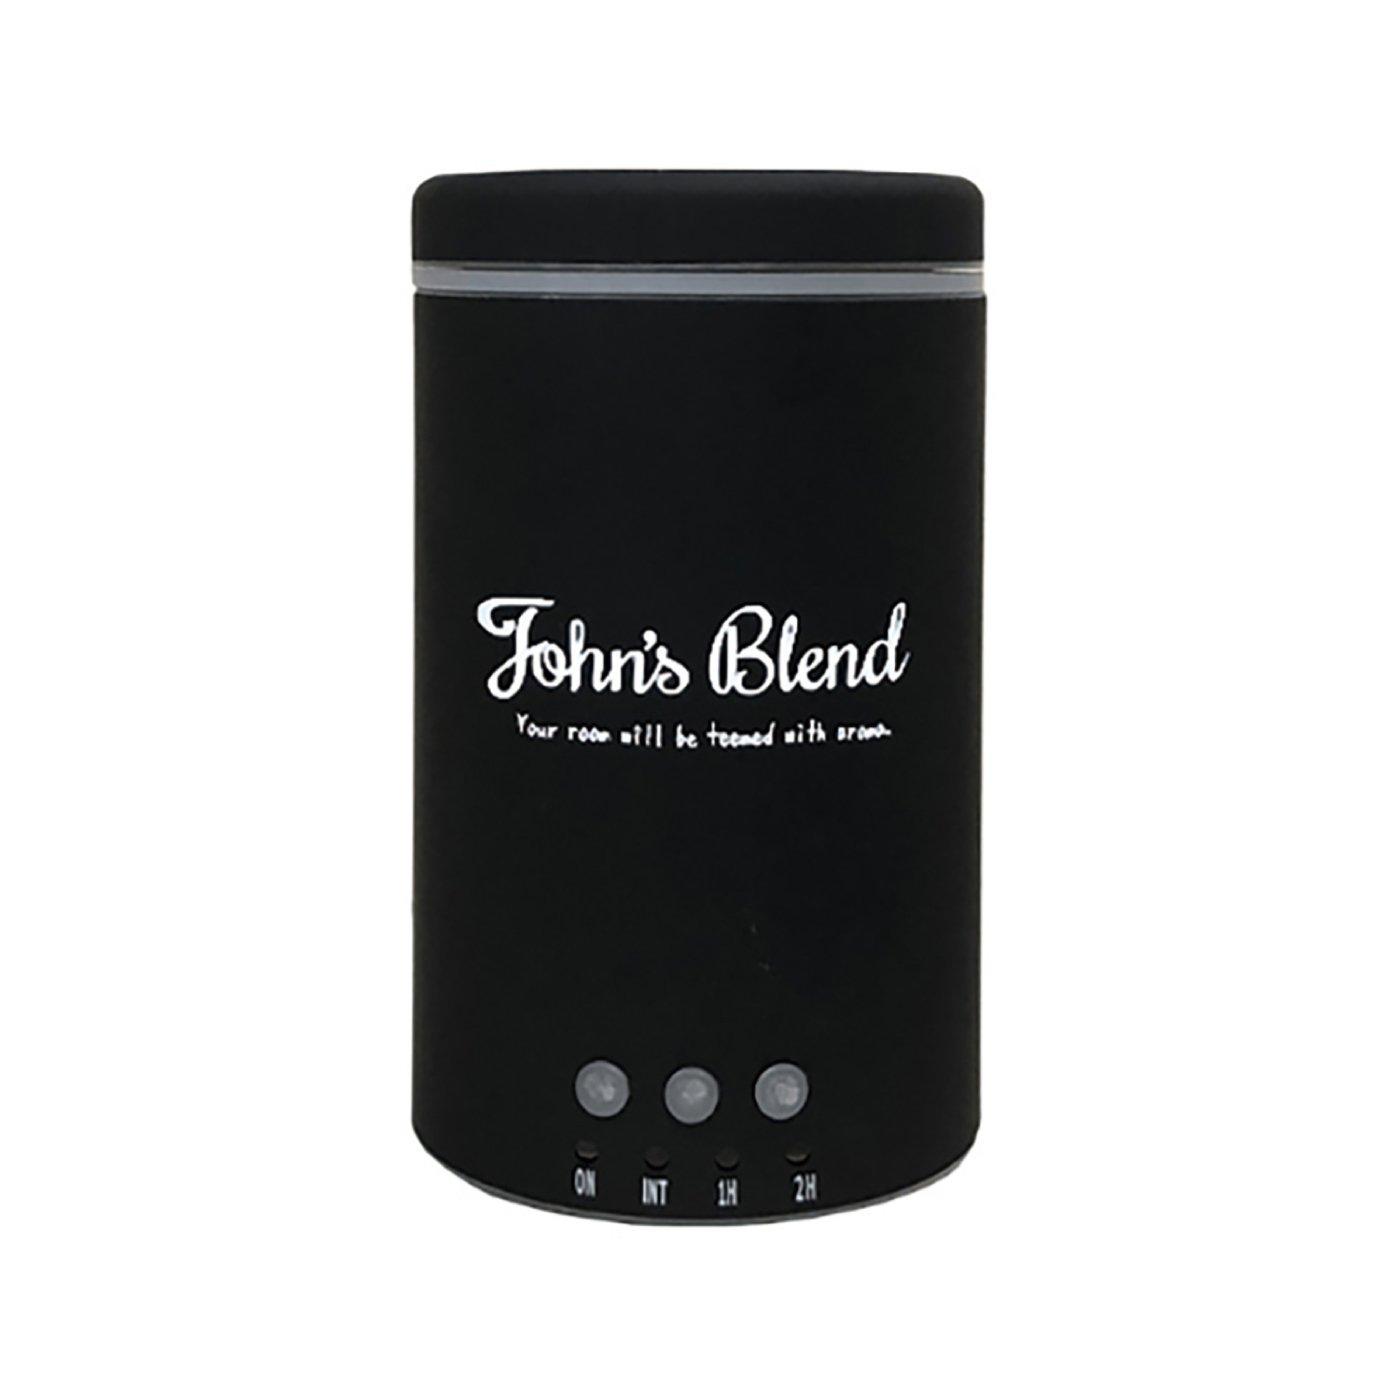 John's Blend おしゃれなロゴ入りアロマディフューザー